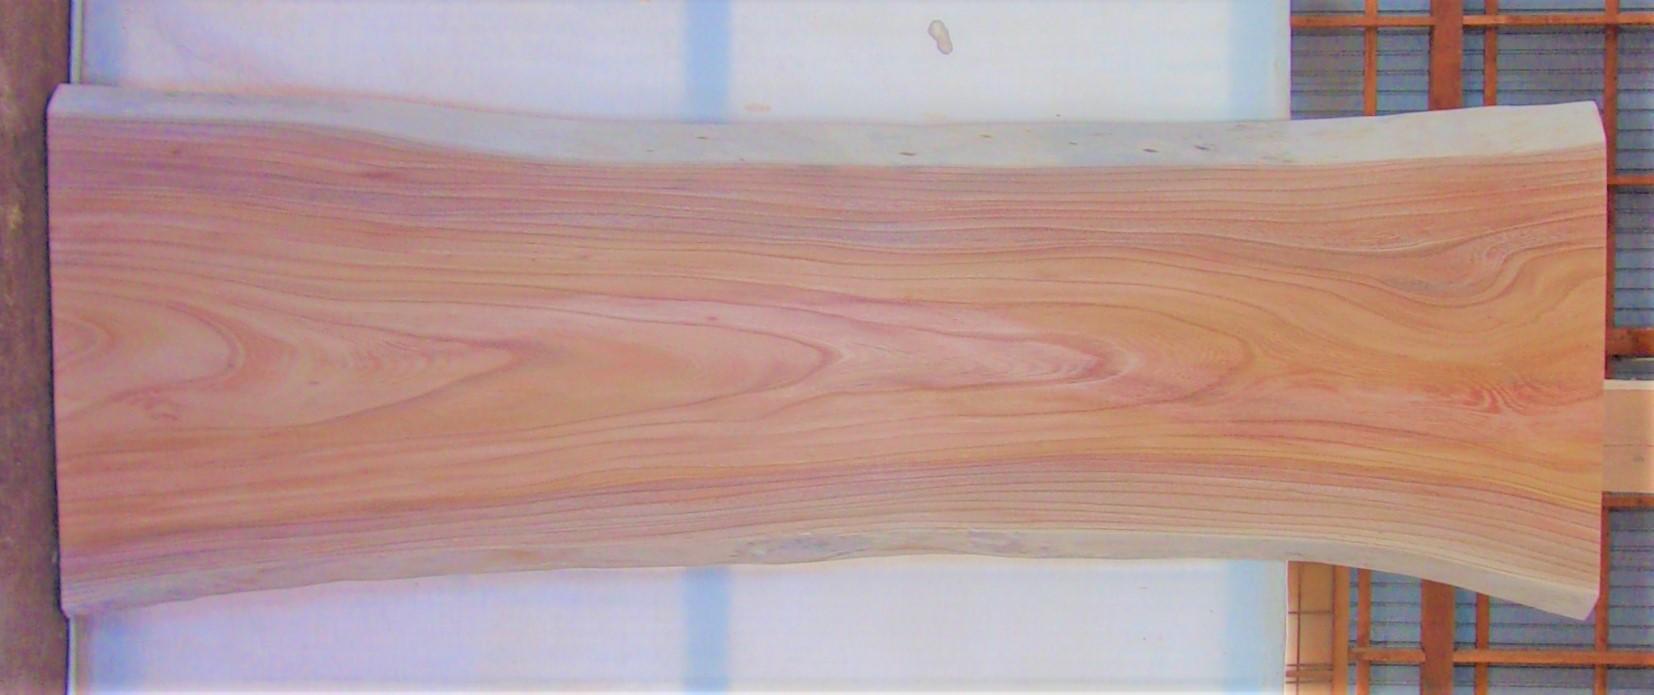 【送料・手数料無料!】 特大型無垢一枚板 KA-628 ケヤキ 特大看板に最適